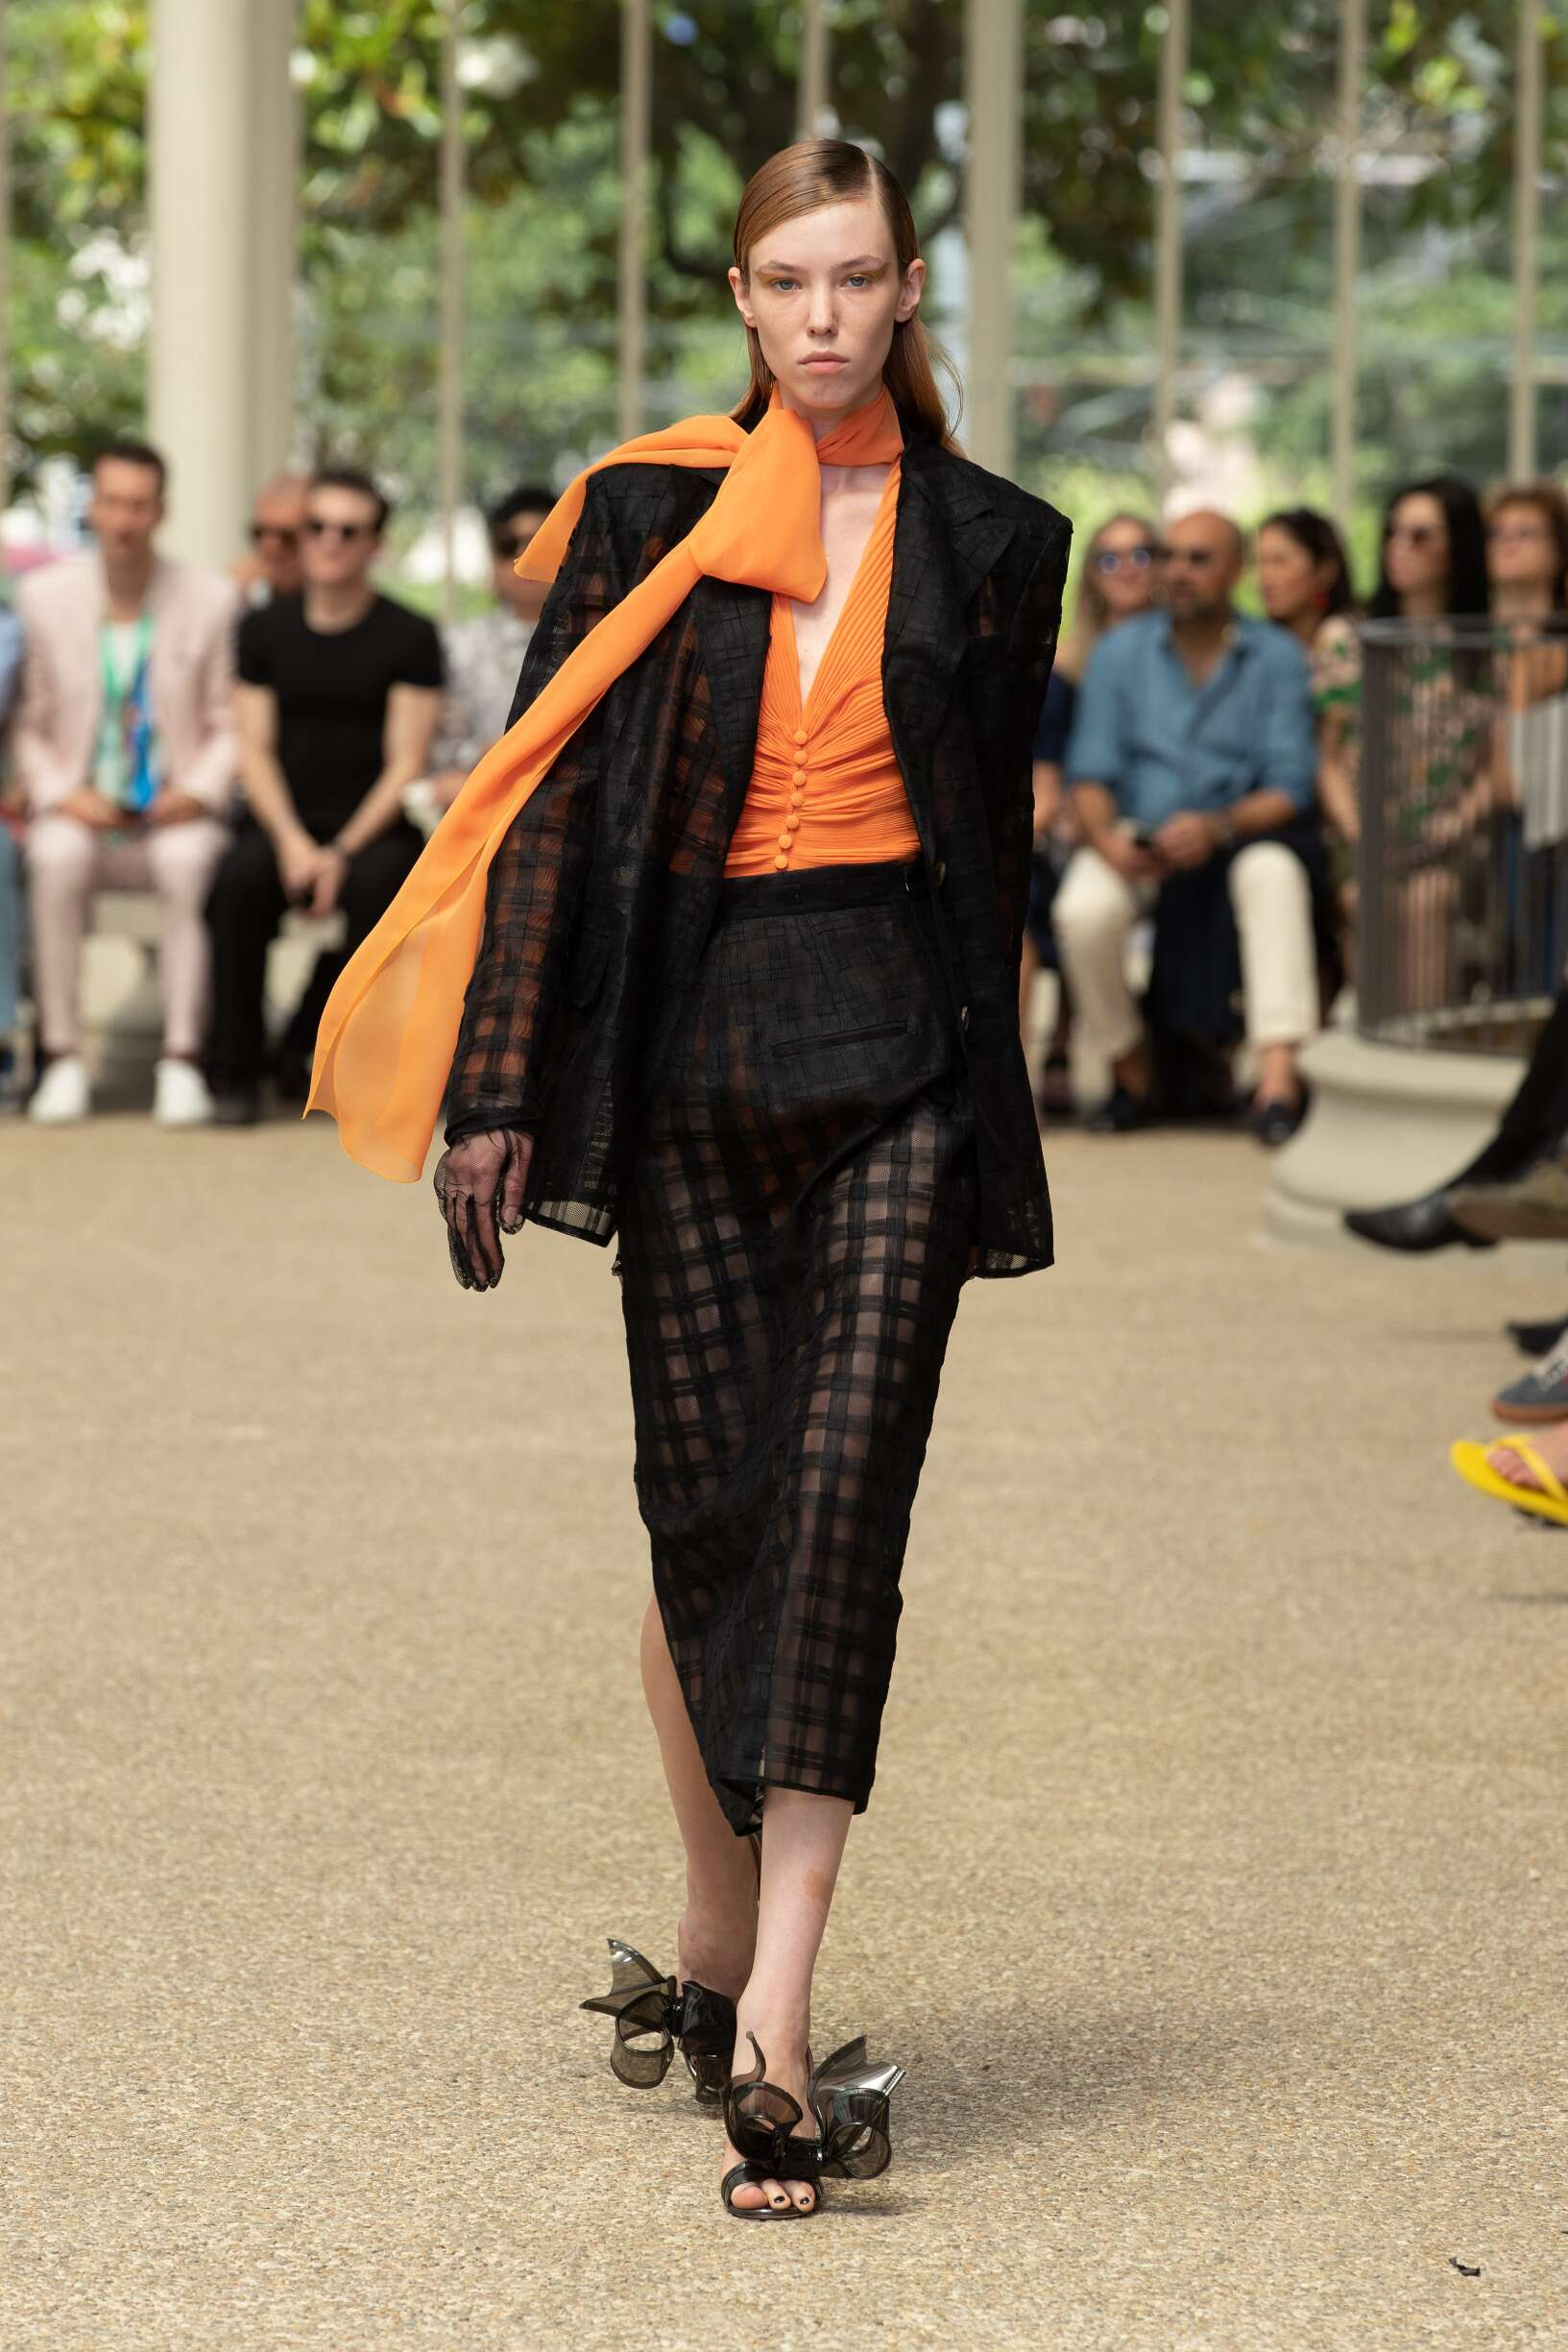 Spring 2020 Womenswear Marco De vincenzo